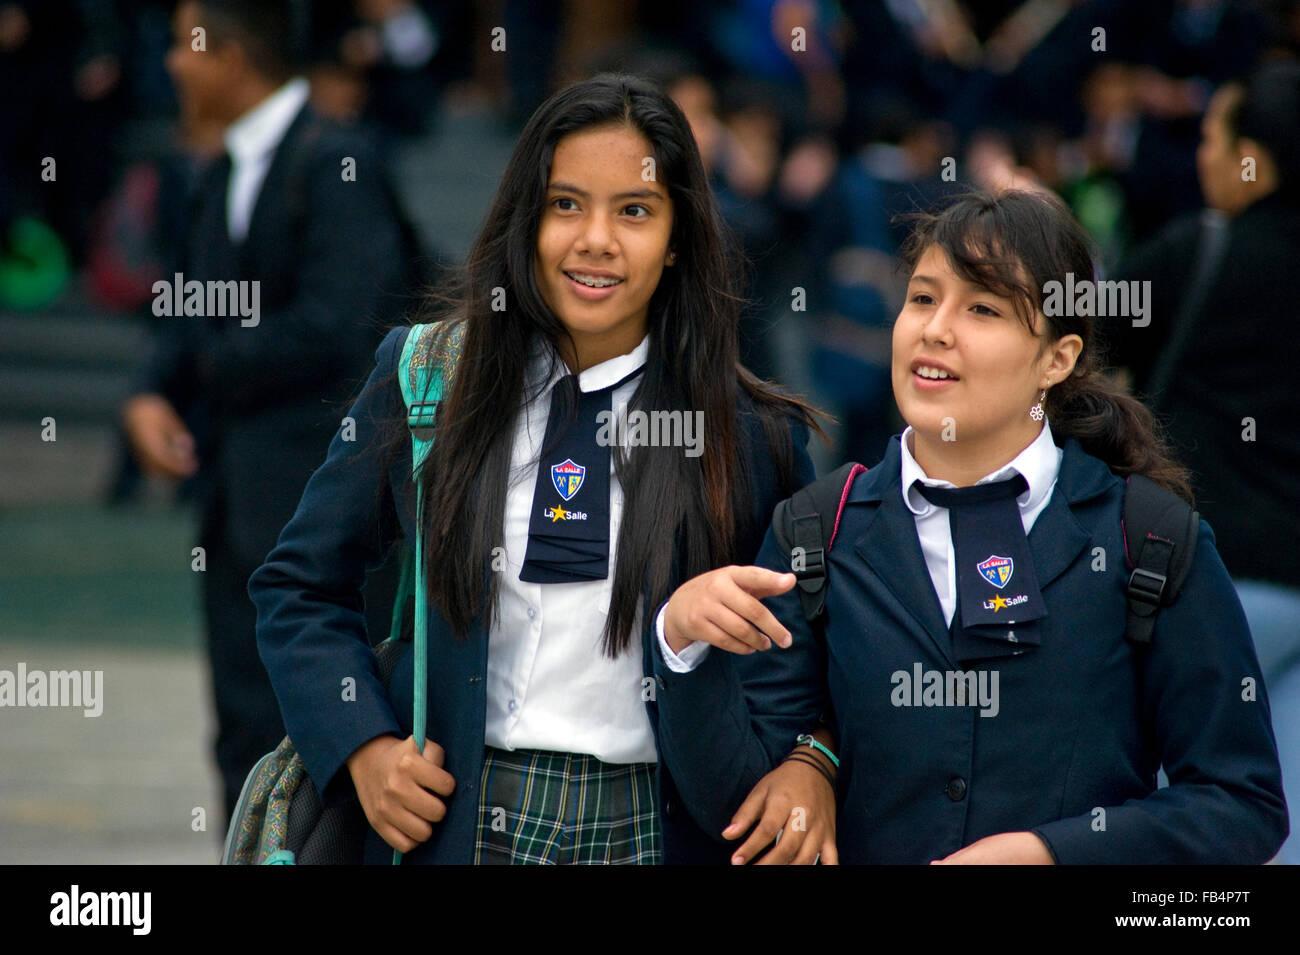 Guayaquil girls